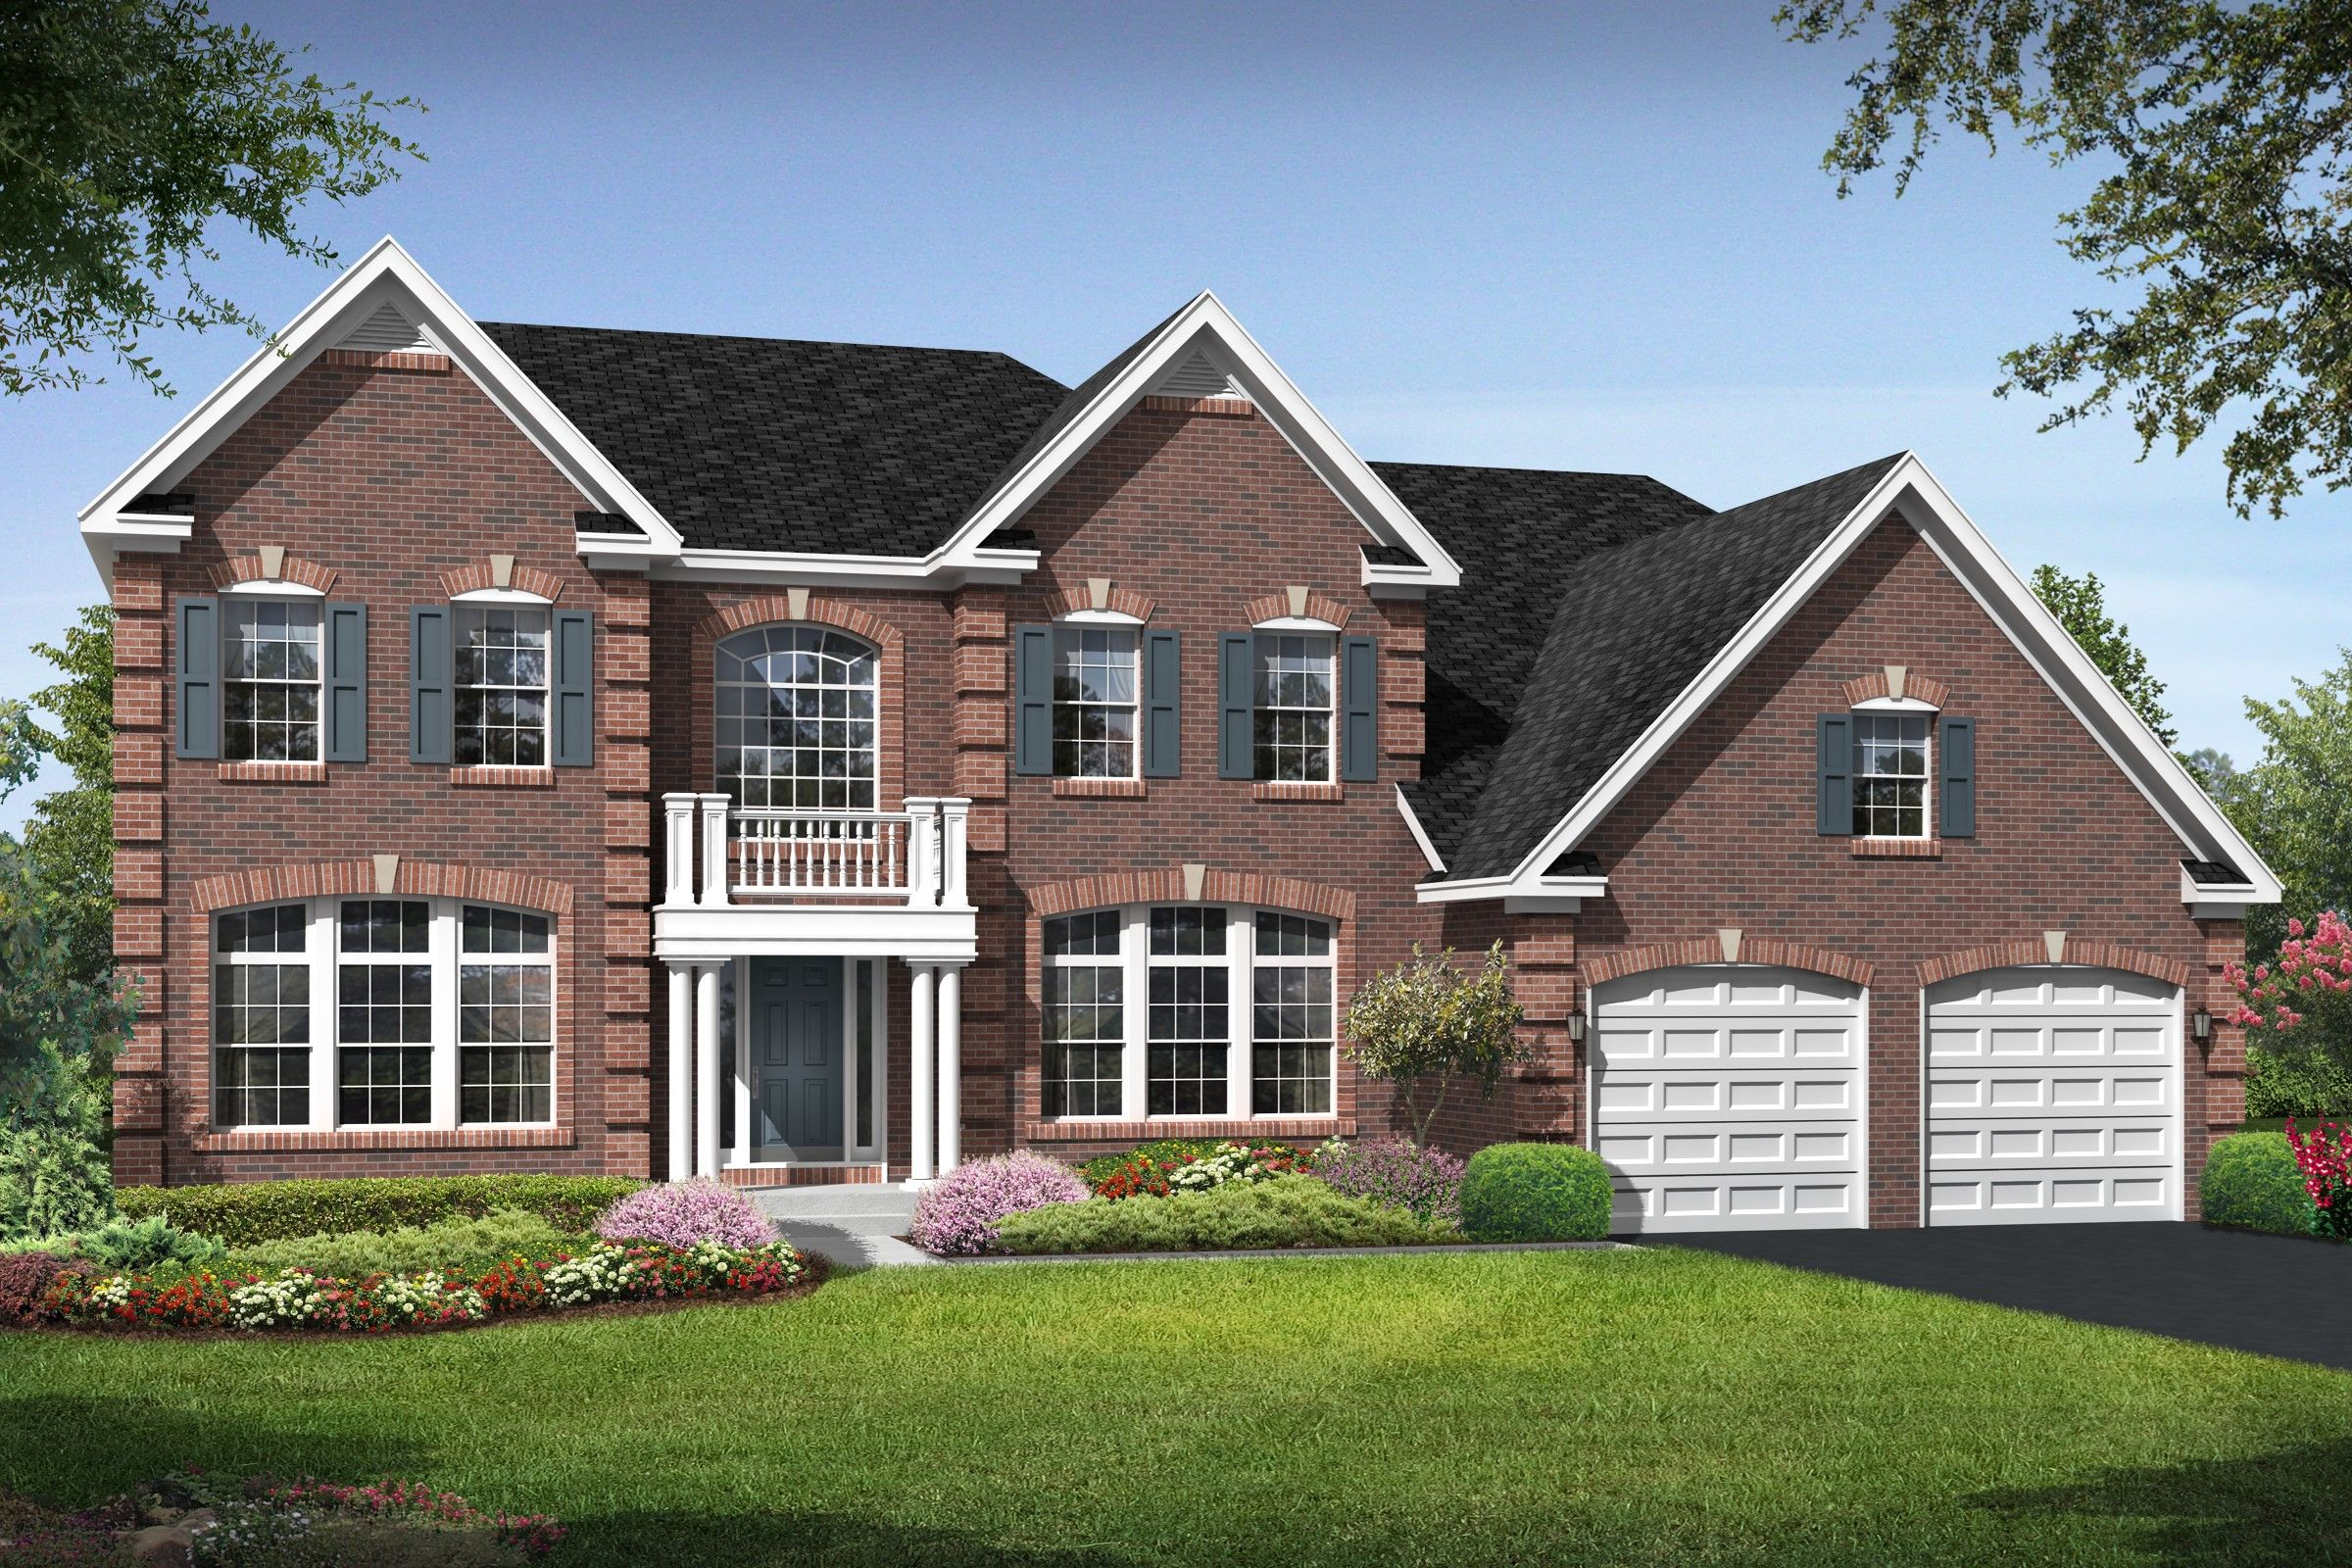 K hovnanian homes floor plans virginia for Virginia house plans